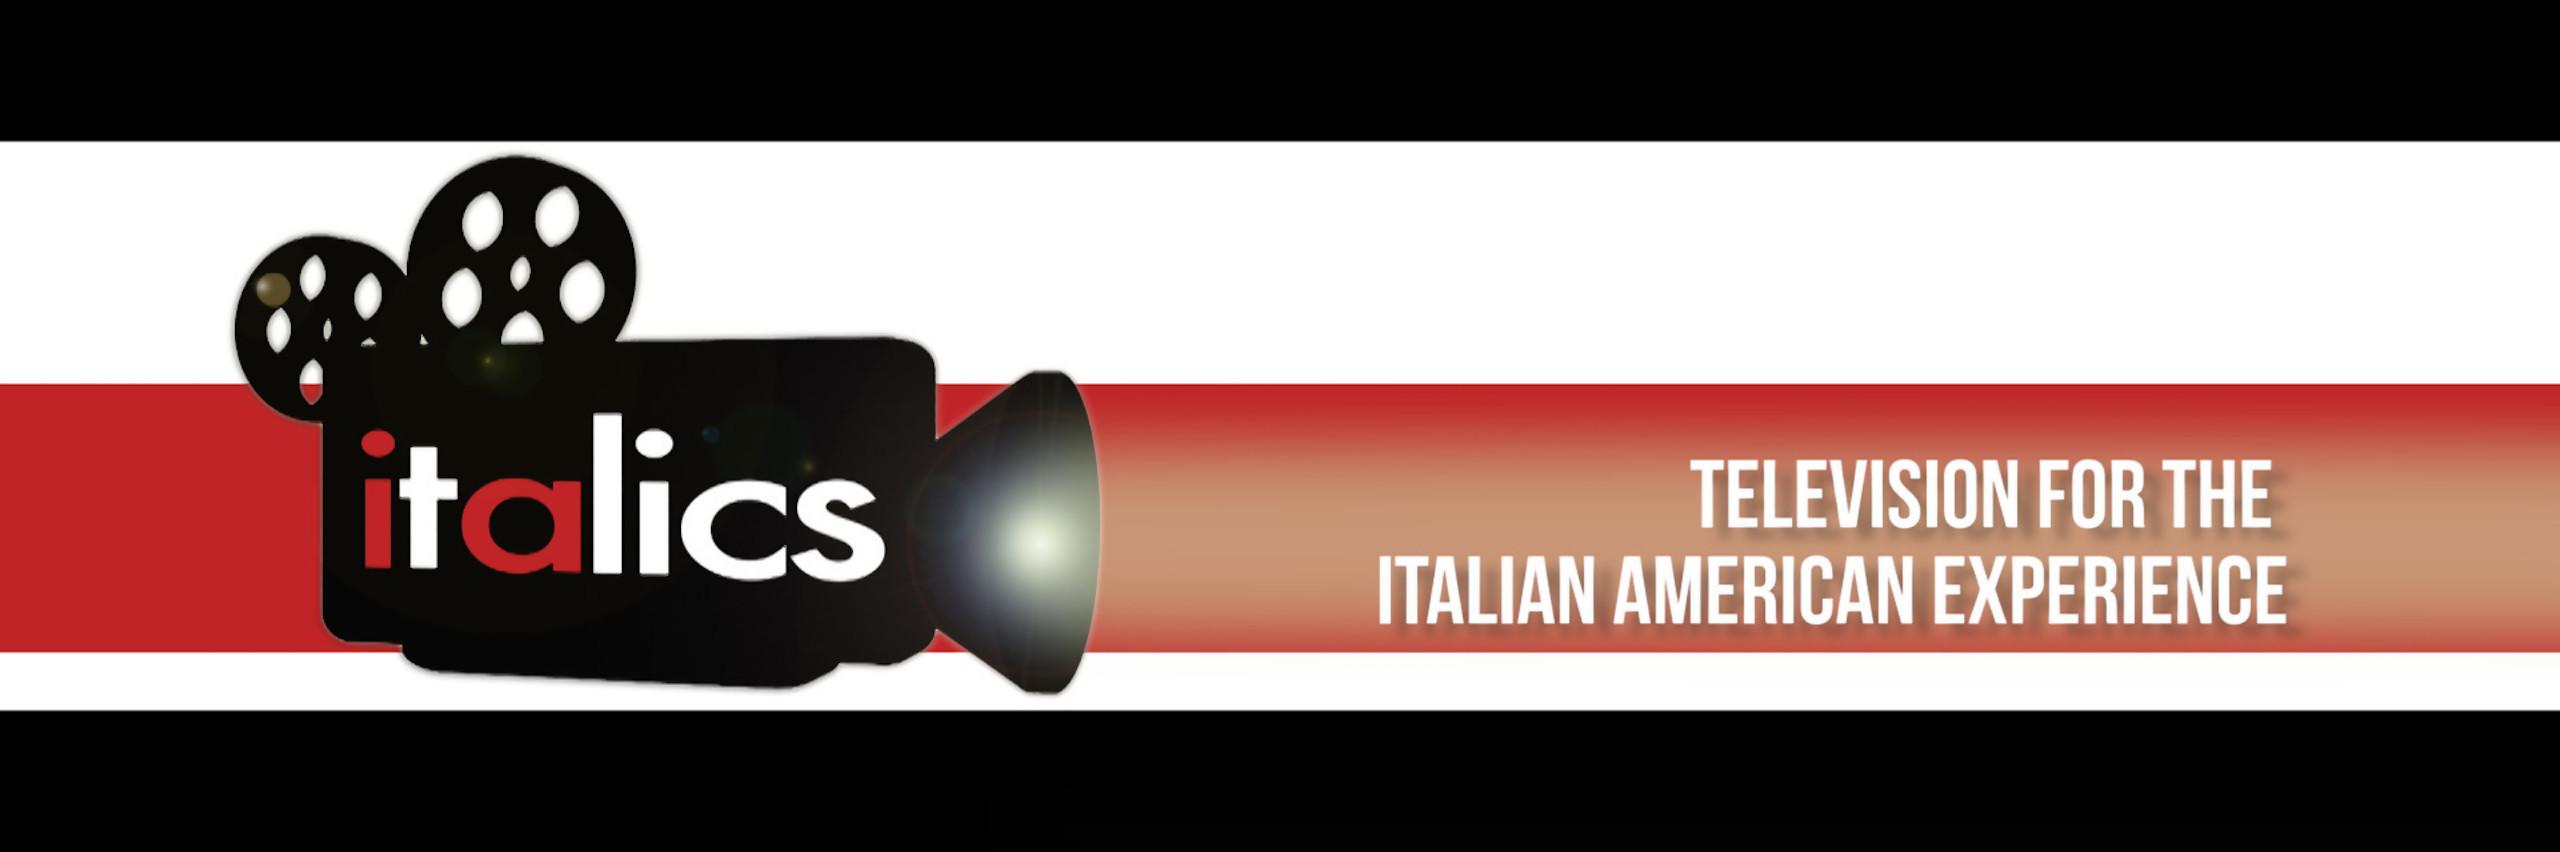 ItalicsTV